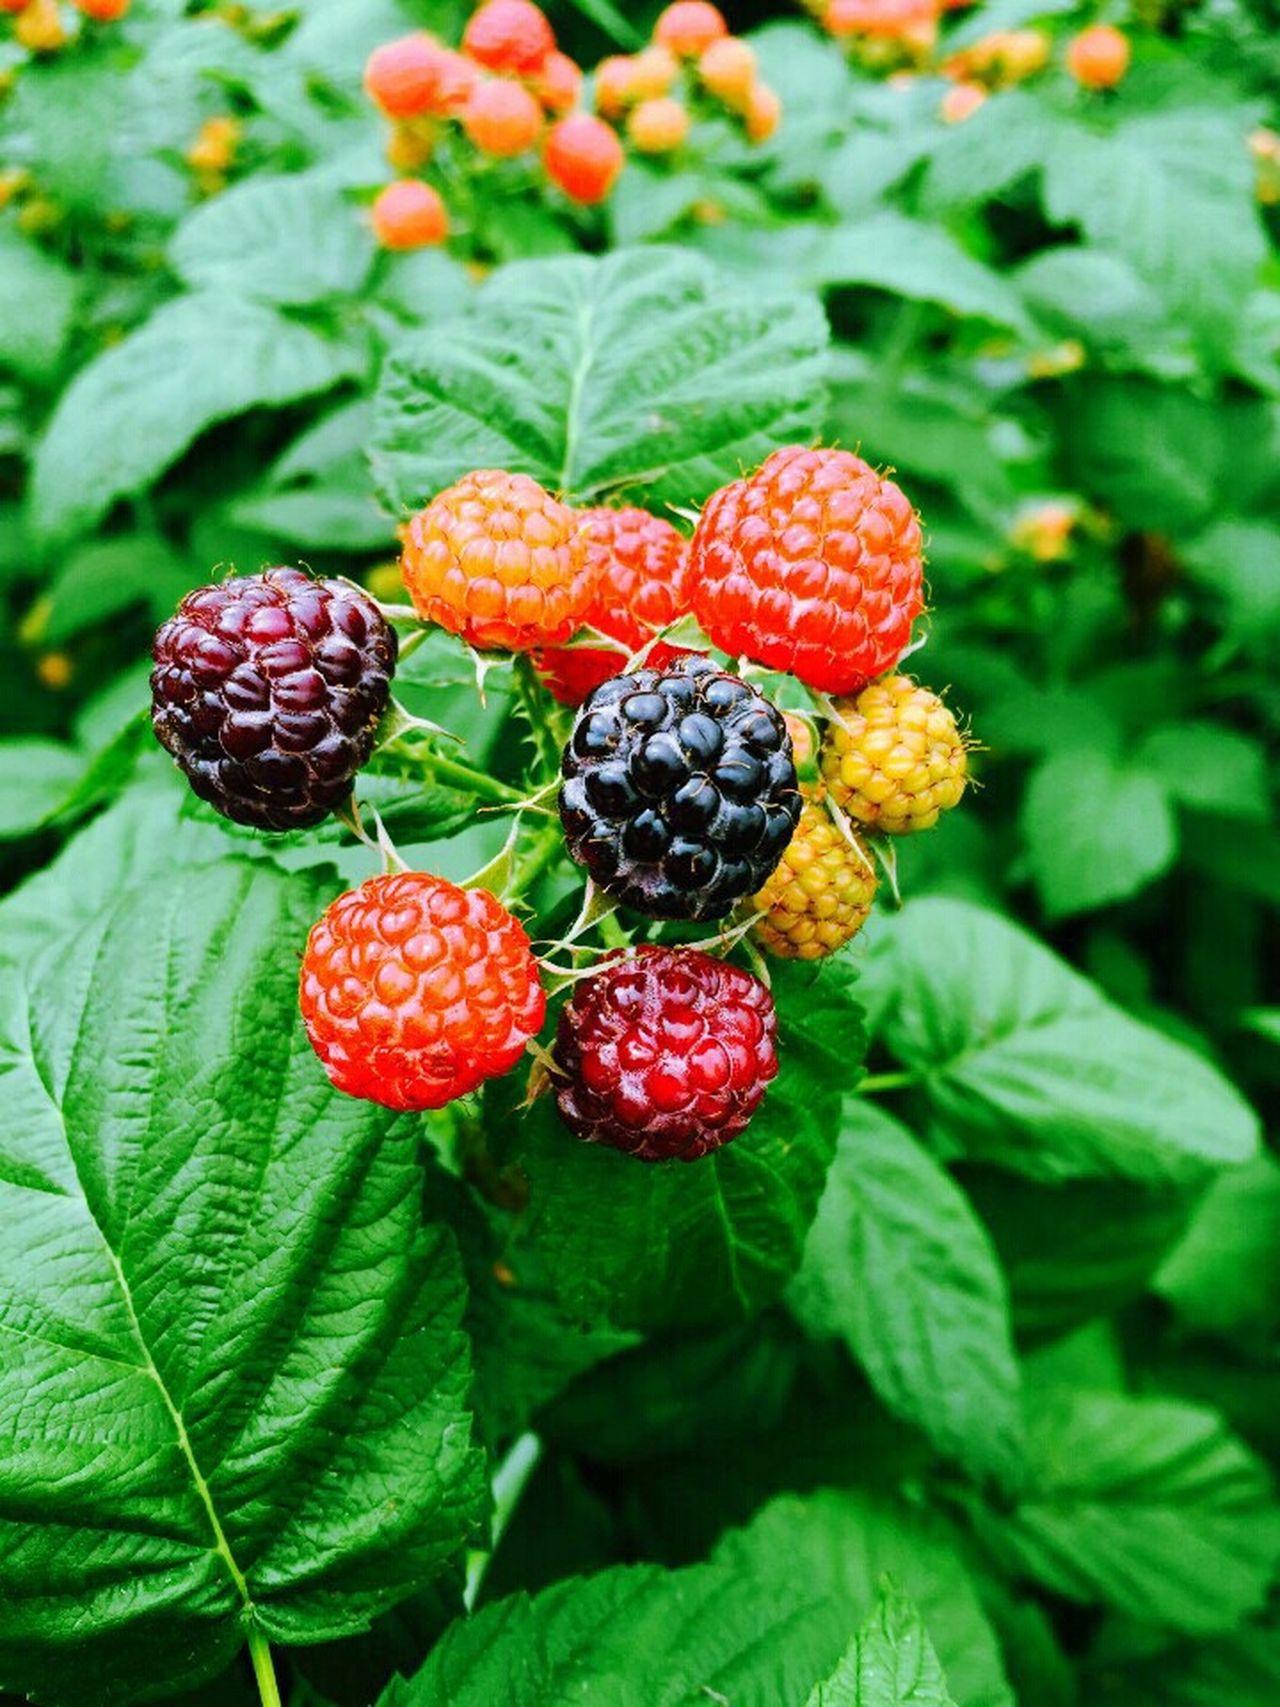 Black Raspberry Grandparent's Farm Fresh Produce Colorful Hamyang South Korea GTGG